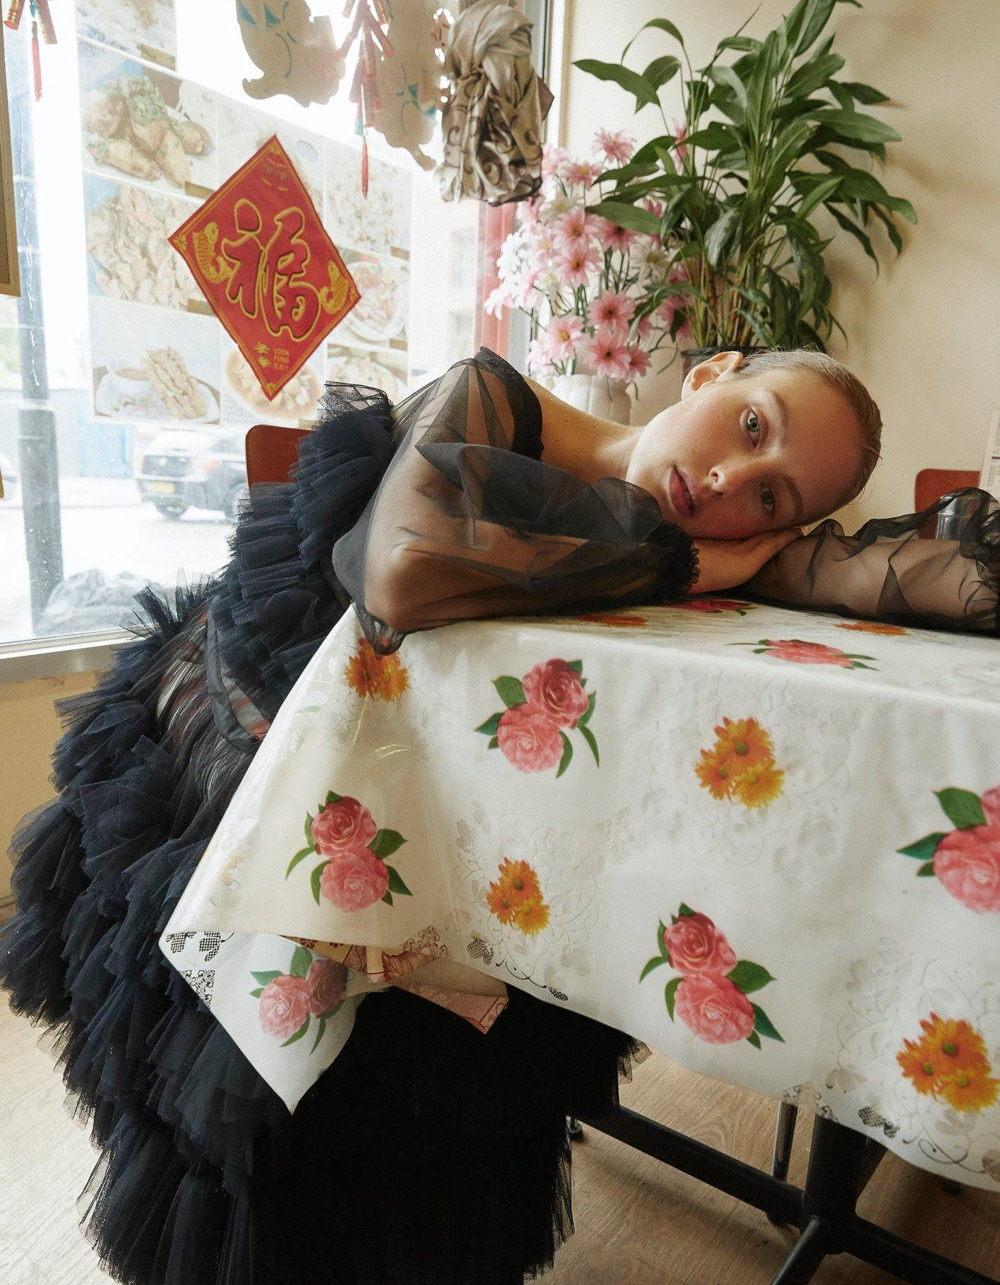 Ina-Lekiewicz-Vogue-Poland-Pia-Priewe-6.jpg